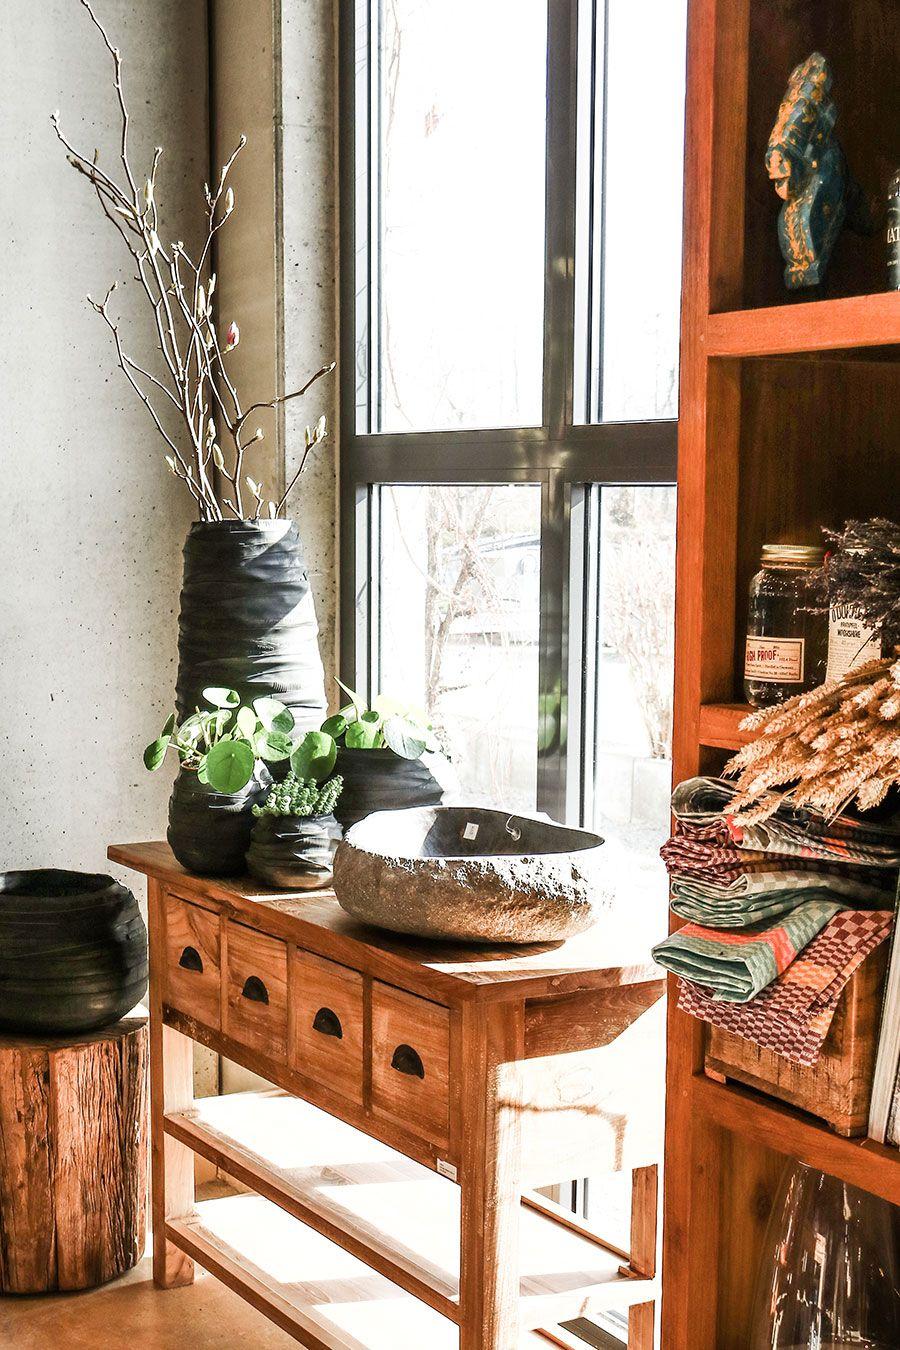 Kolonialstil Le country konsole teakholz kolonialstil kleinmöbel bestellmöbel